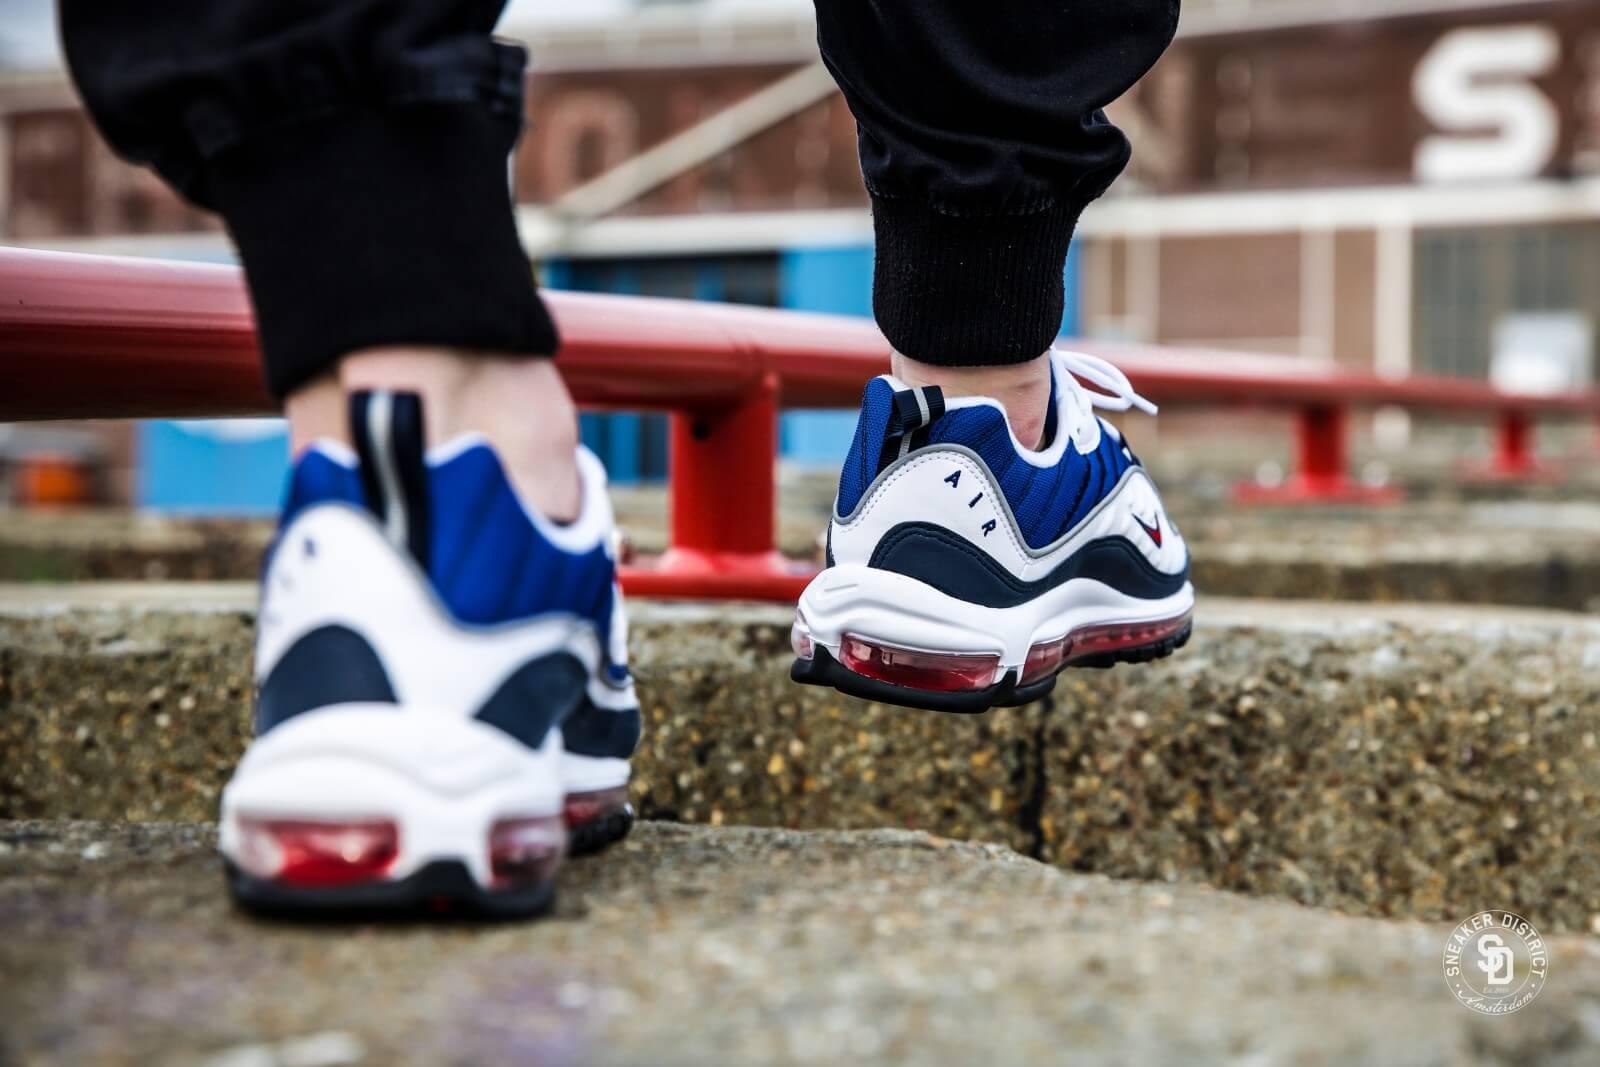 Nike Air Max 98 Kvinner Røde Jeans L5ioz